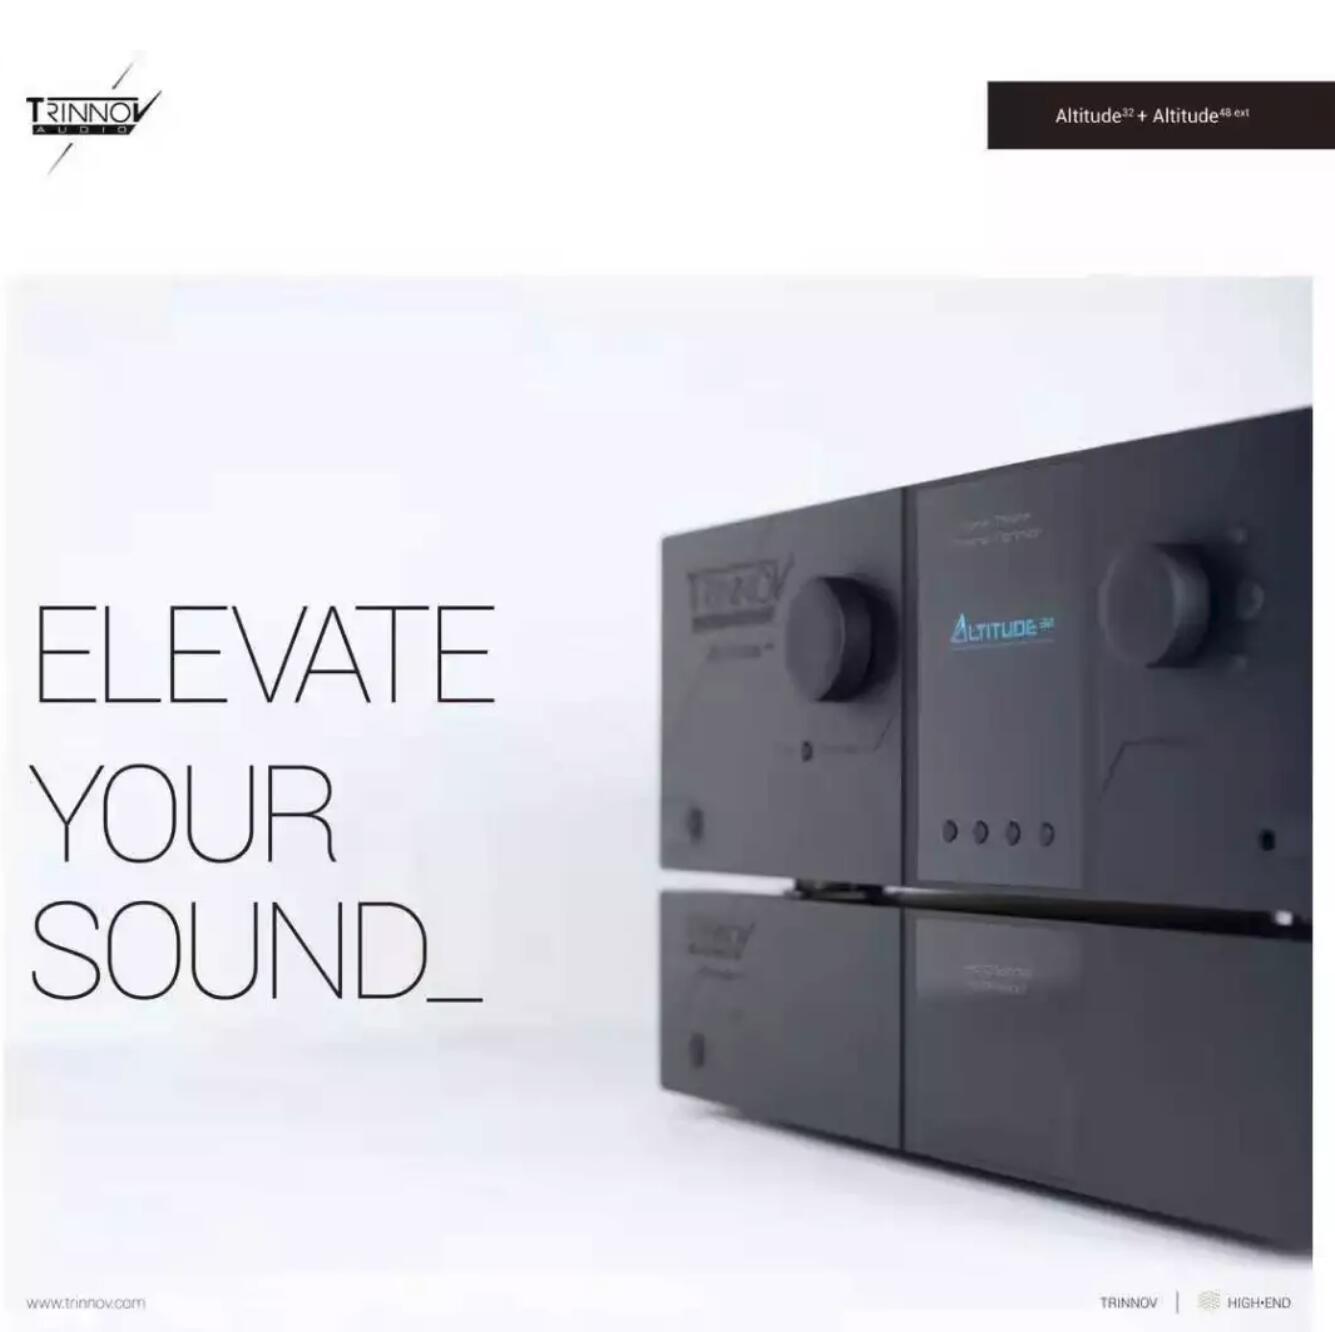 Trinnov Altitude48ext:唯一能真正解封家用全景声Atmos最高标准24.1.10的3D音效处理器